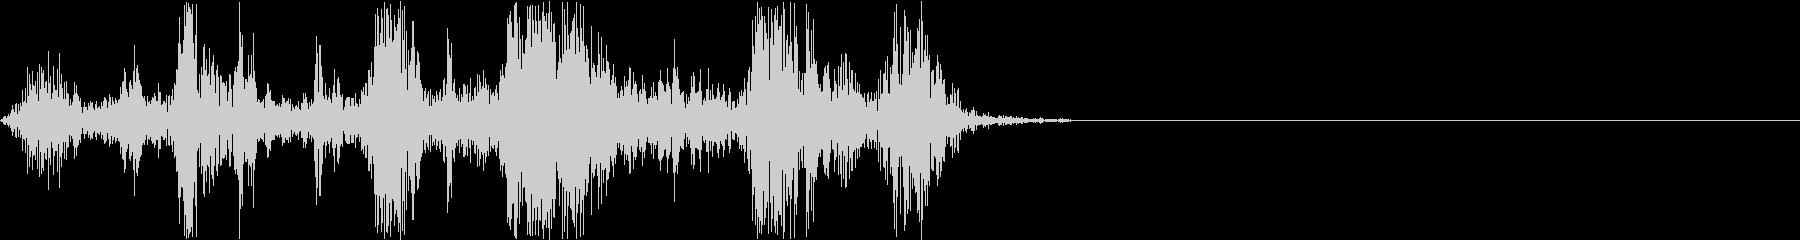 Camera シャッター ドライ音 3の未再生の波形